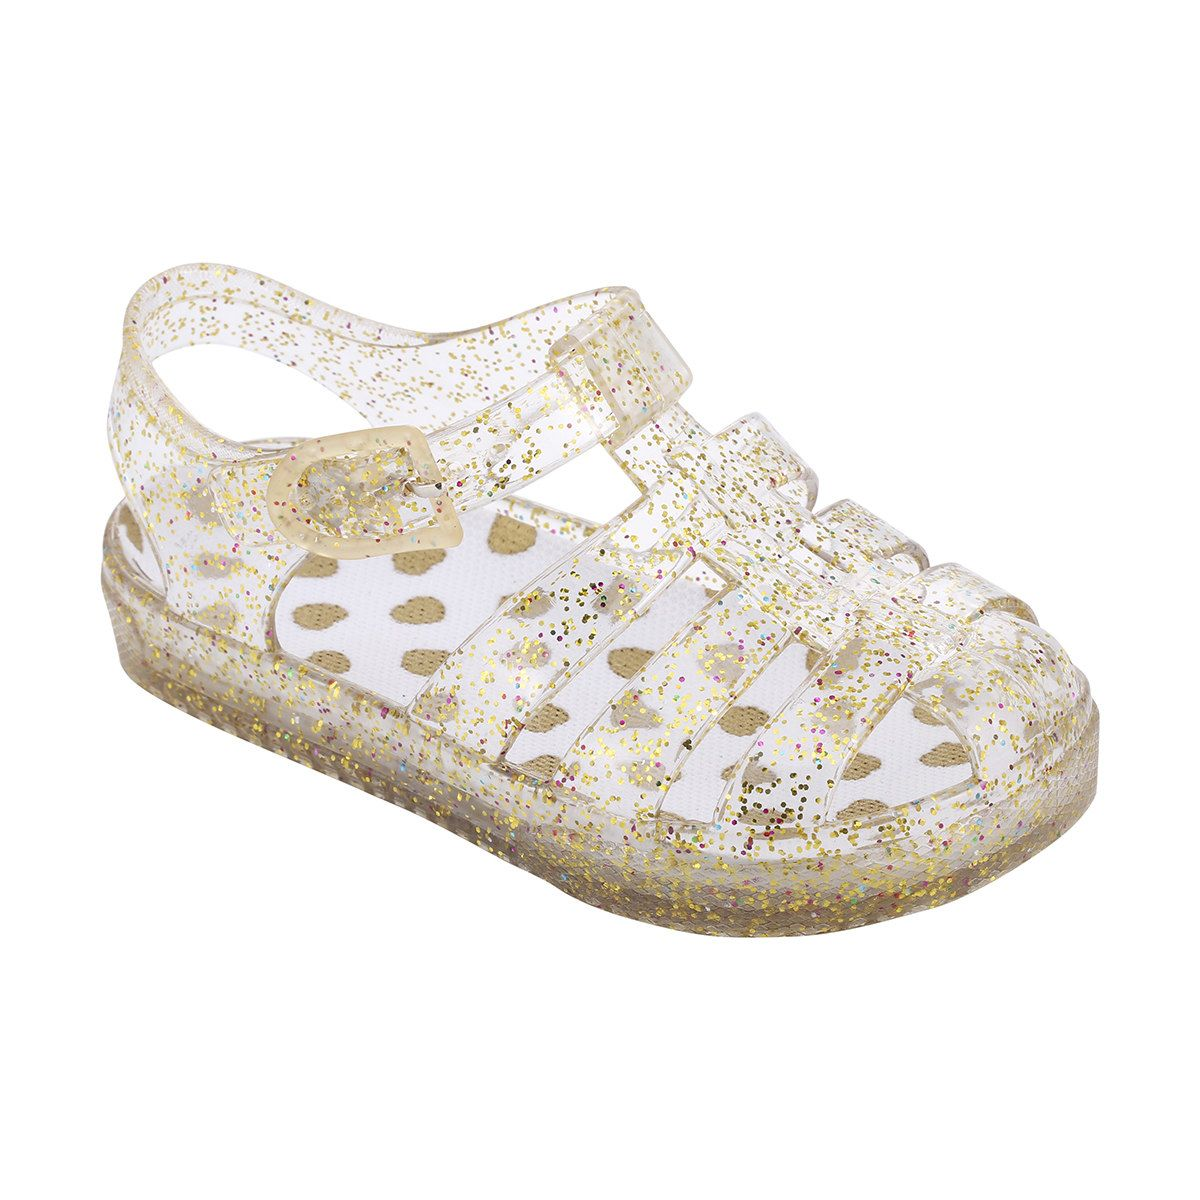 Printed Sandals | Kmart | Sneakers